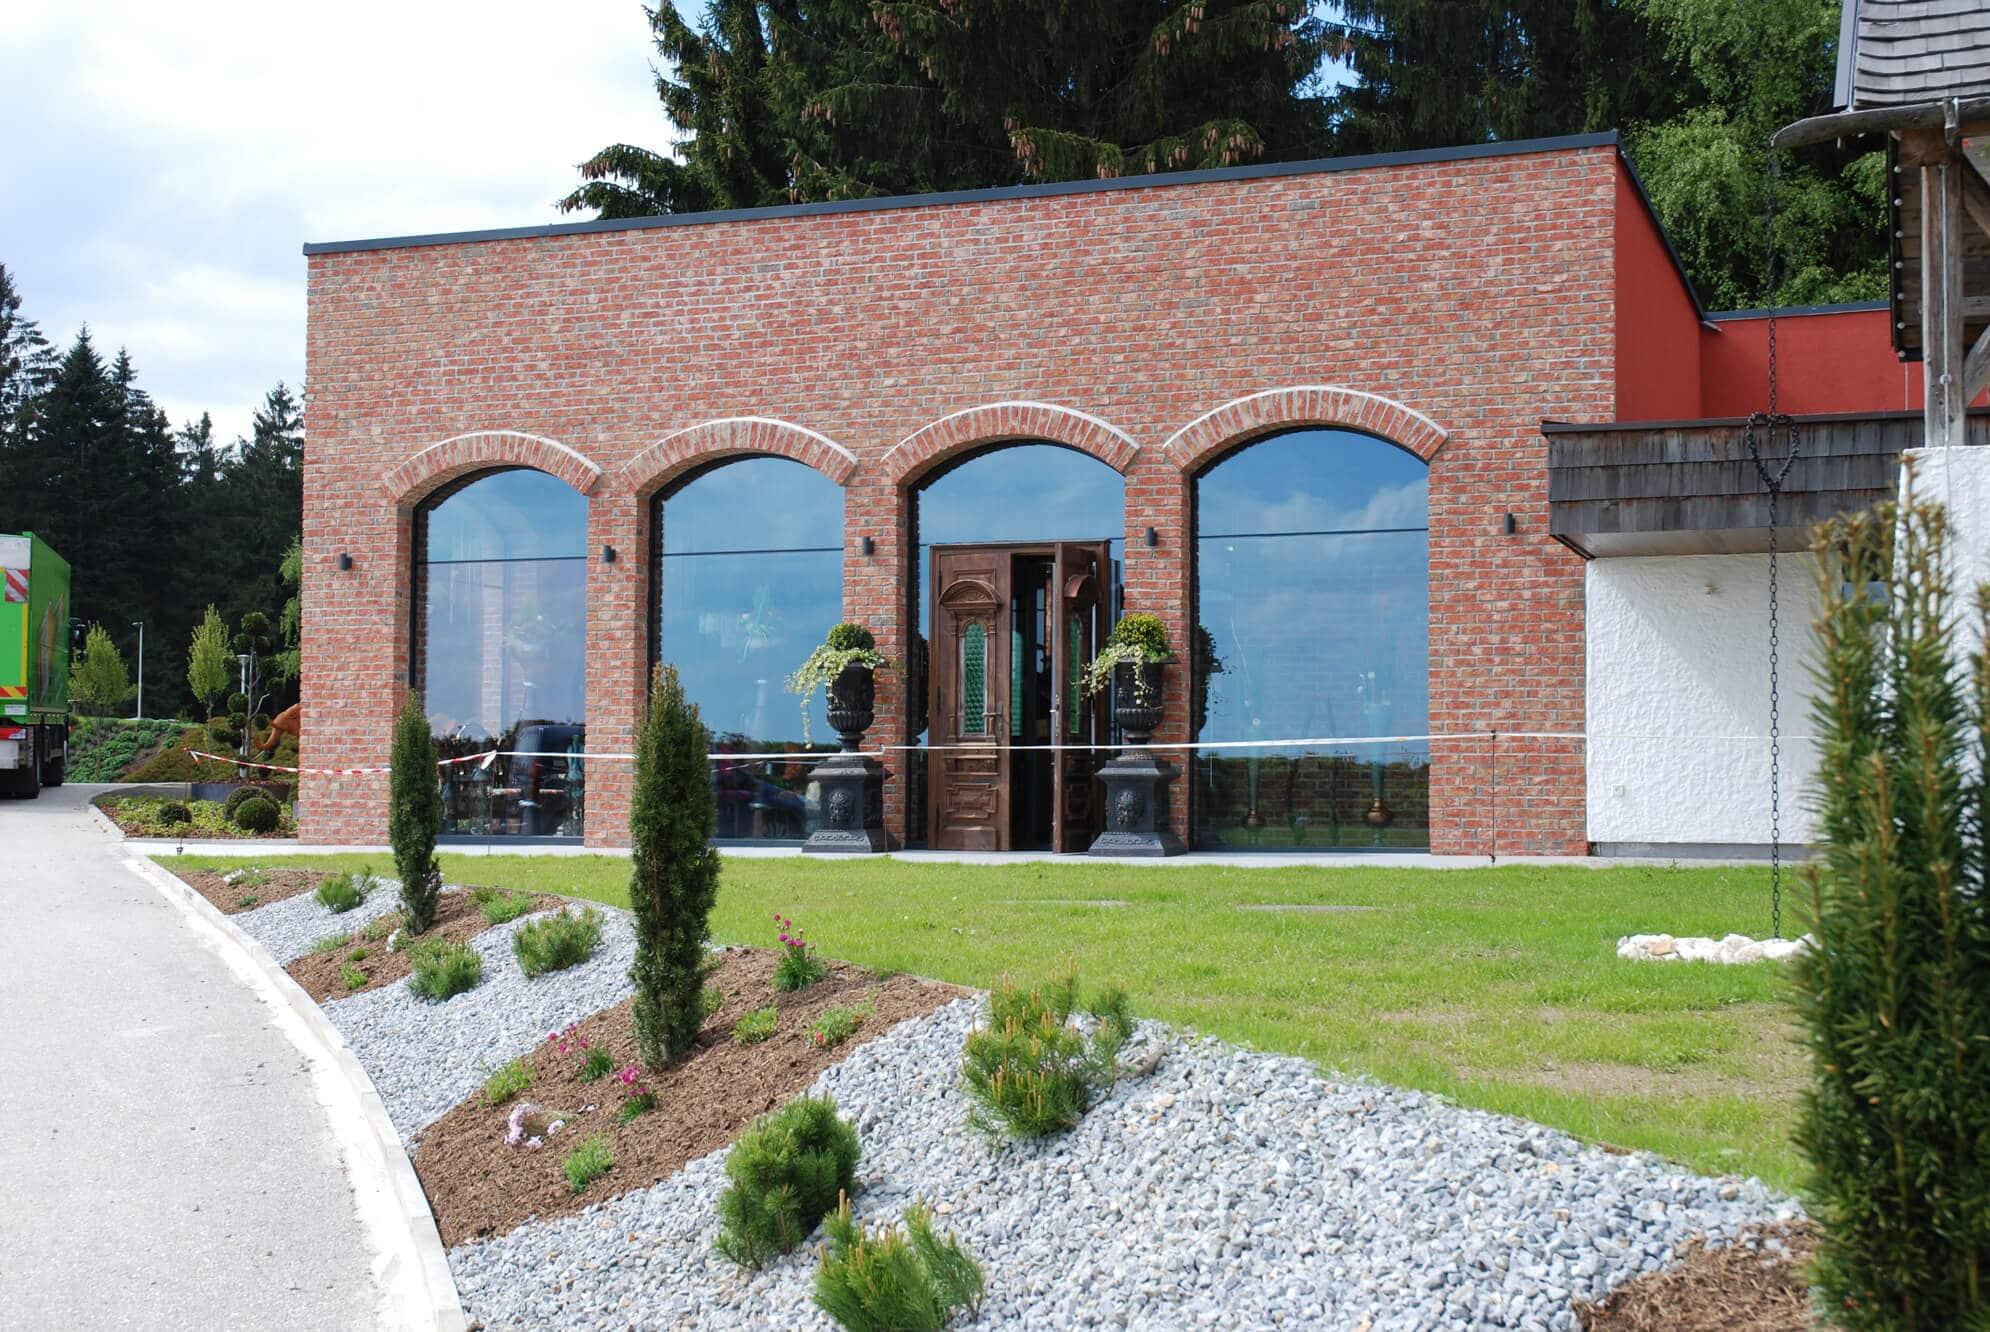 Aluminium Fenster für Brauhaus